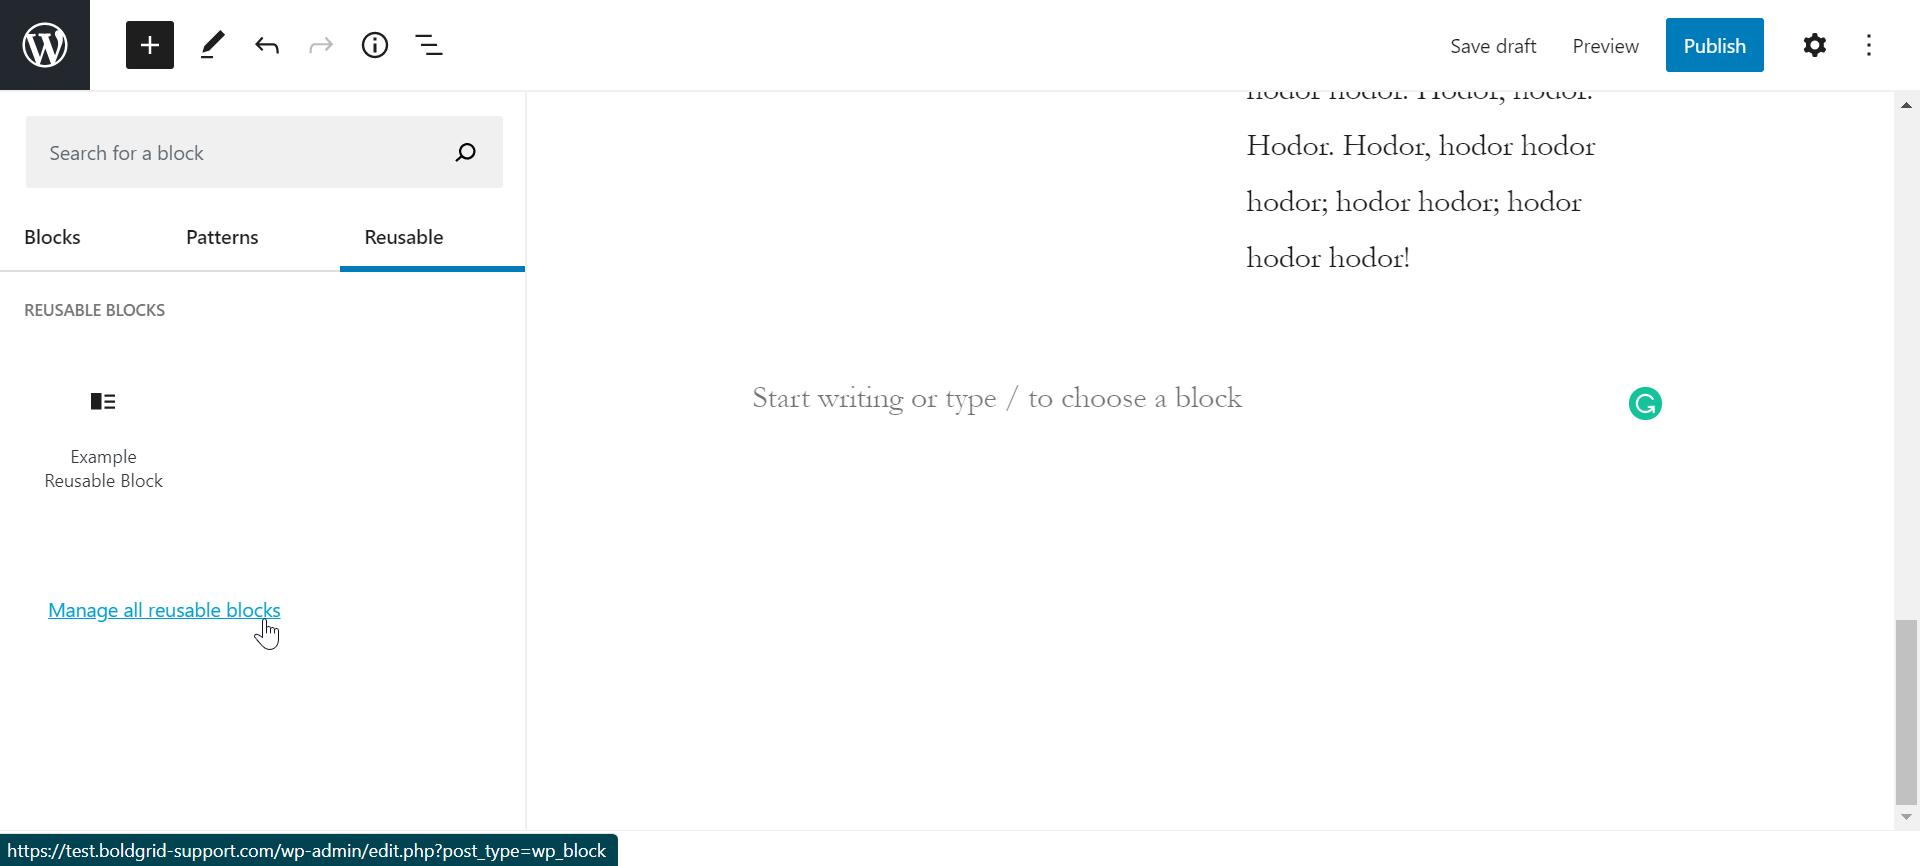 Manage reusable block in wordpress